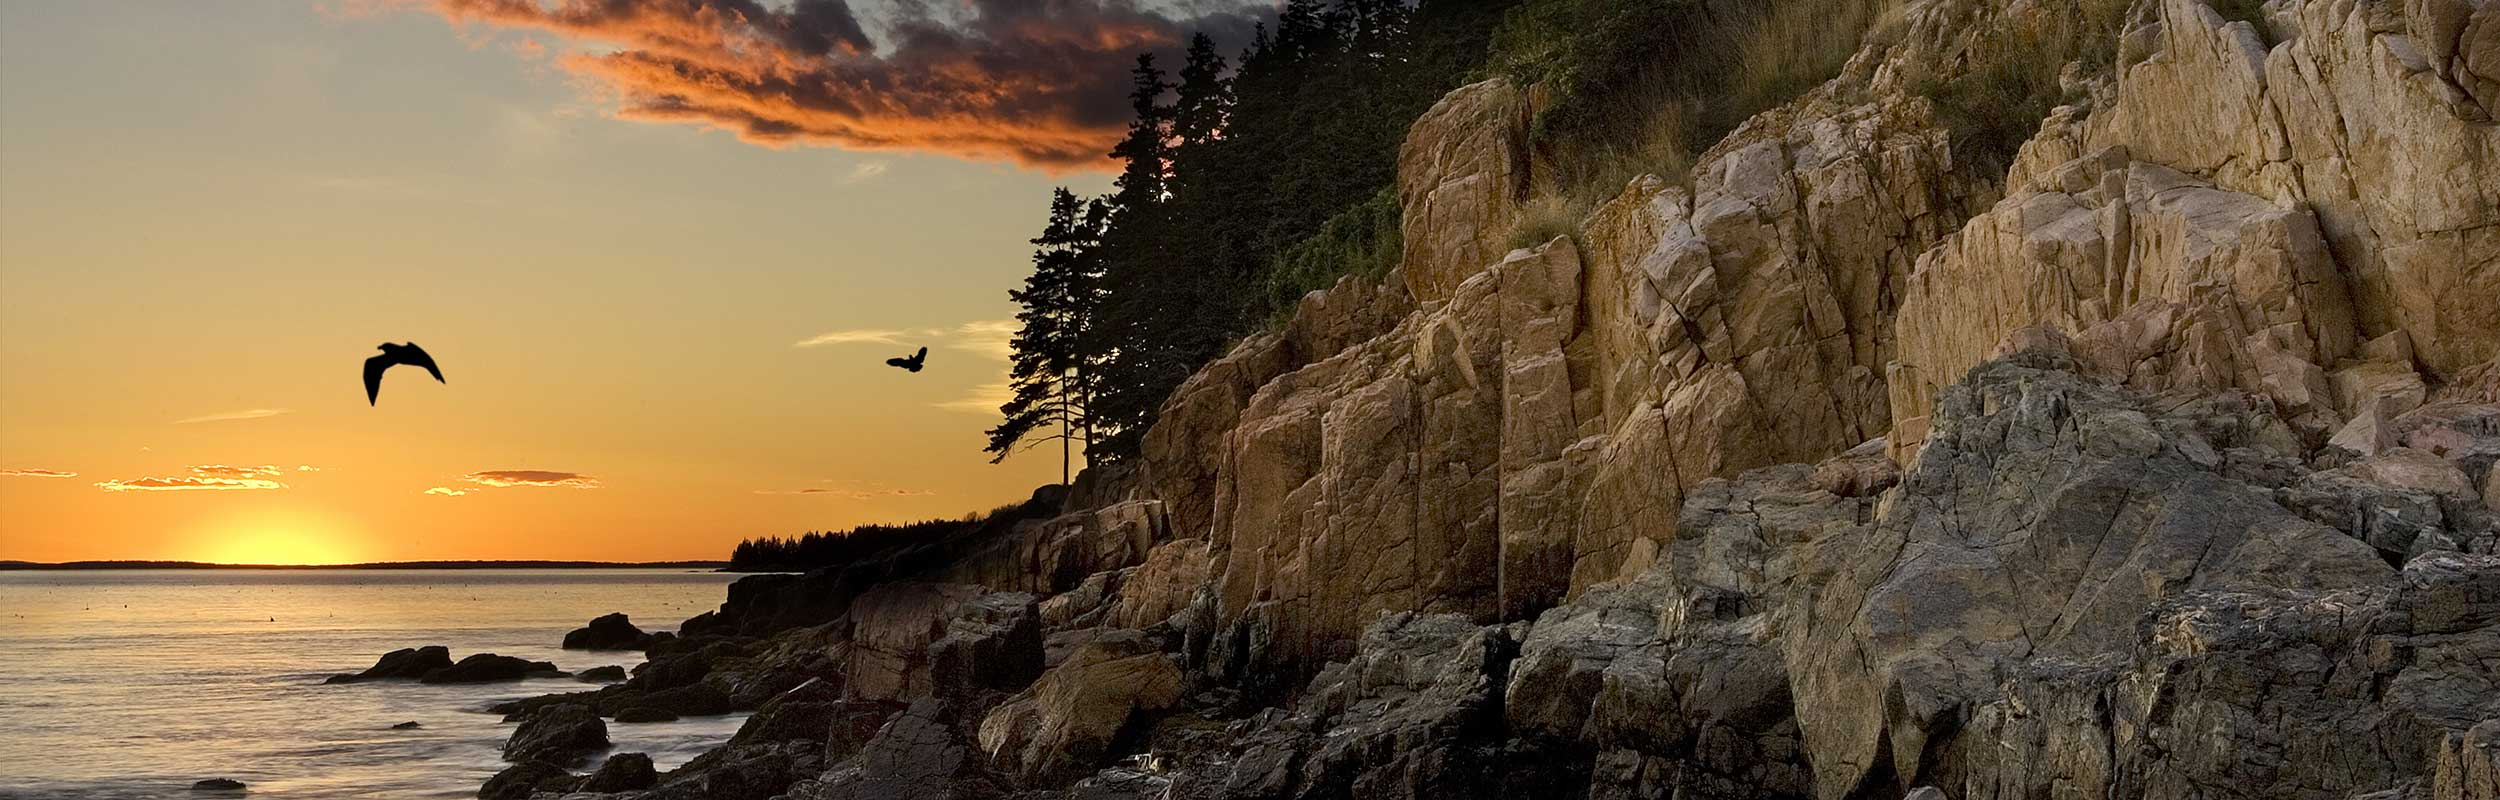 rocky Maine shoreline sunset